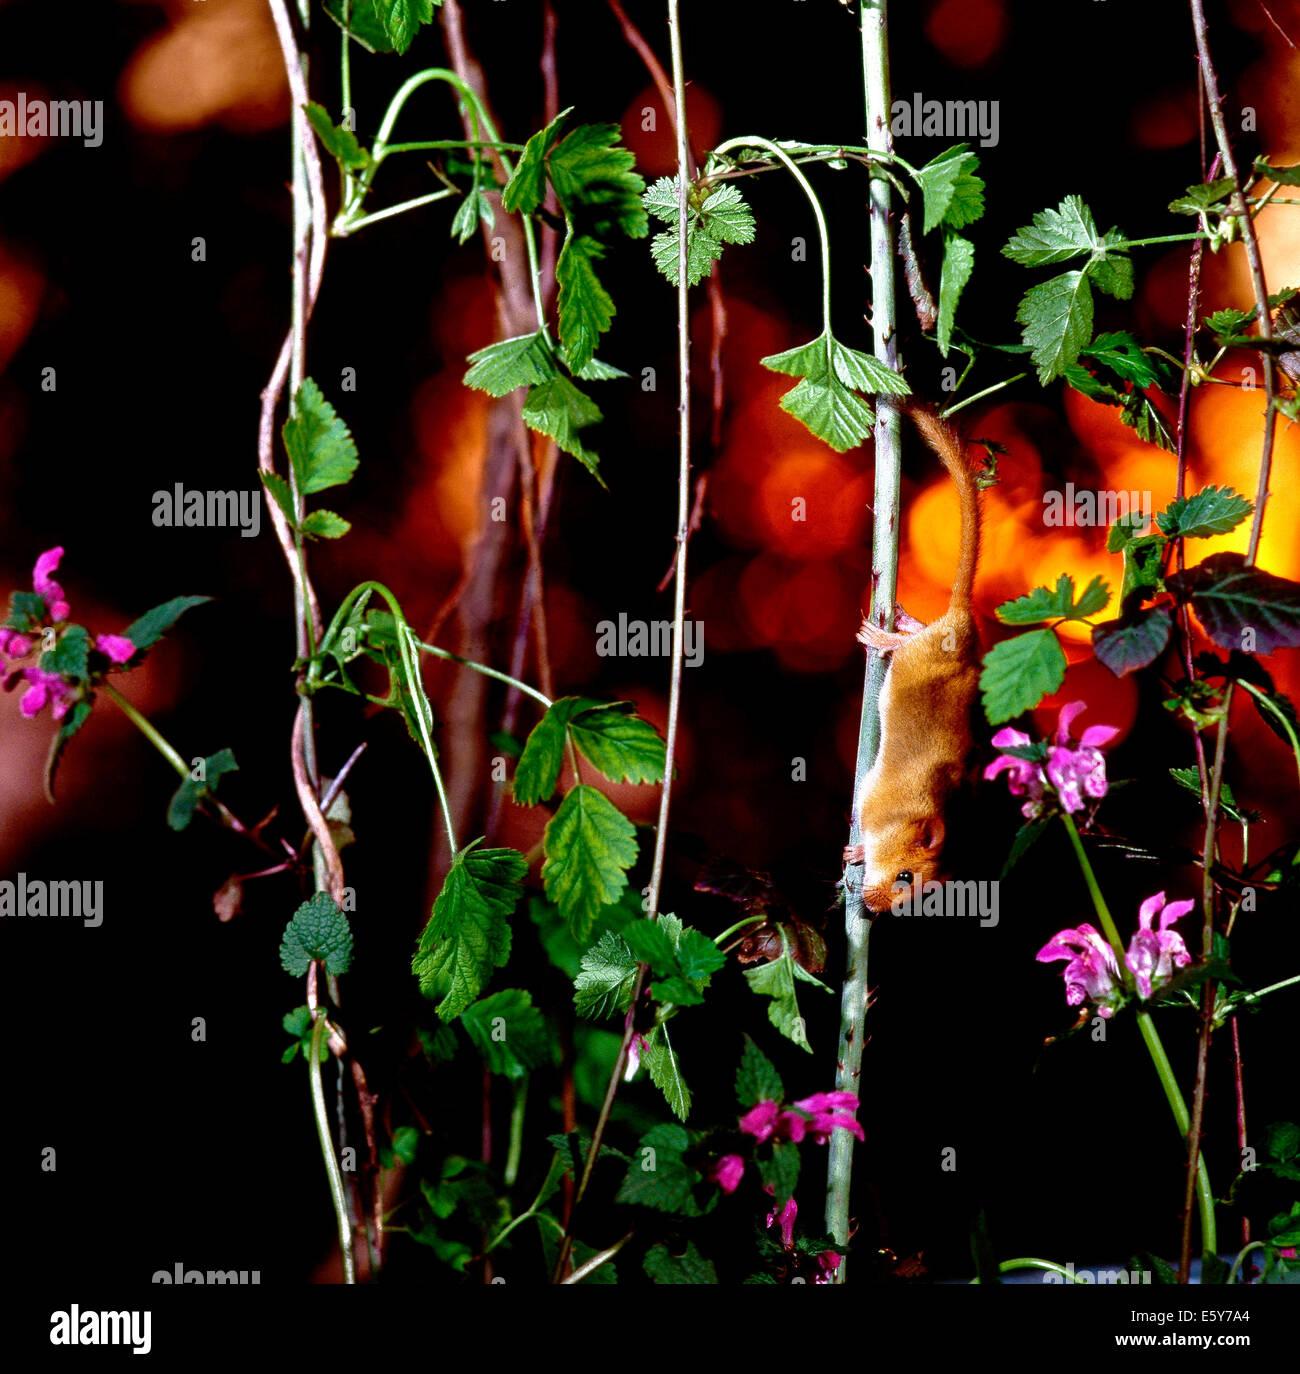 Hazel Dormouse (Muscardinus avellanarius) climbing on the stems  of a blackberry bush at sunset. - Stock Image